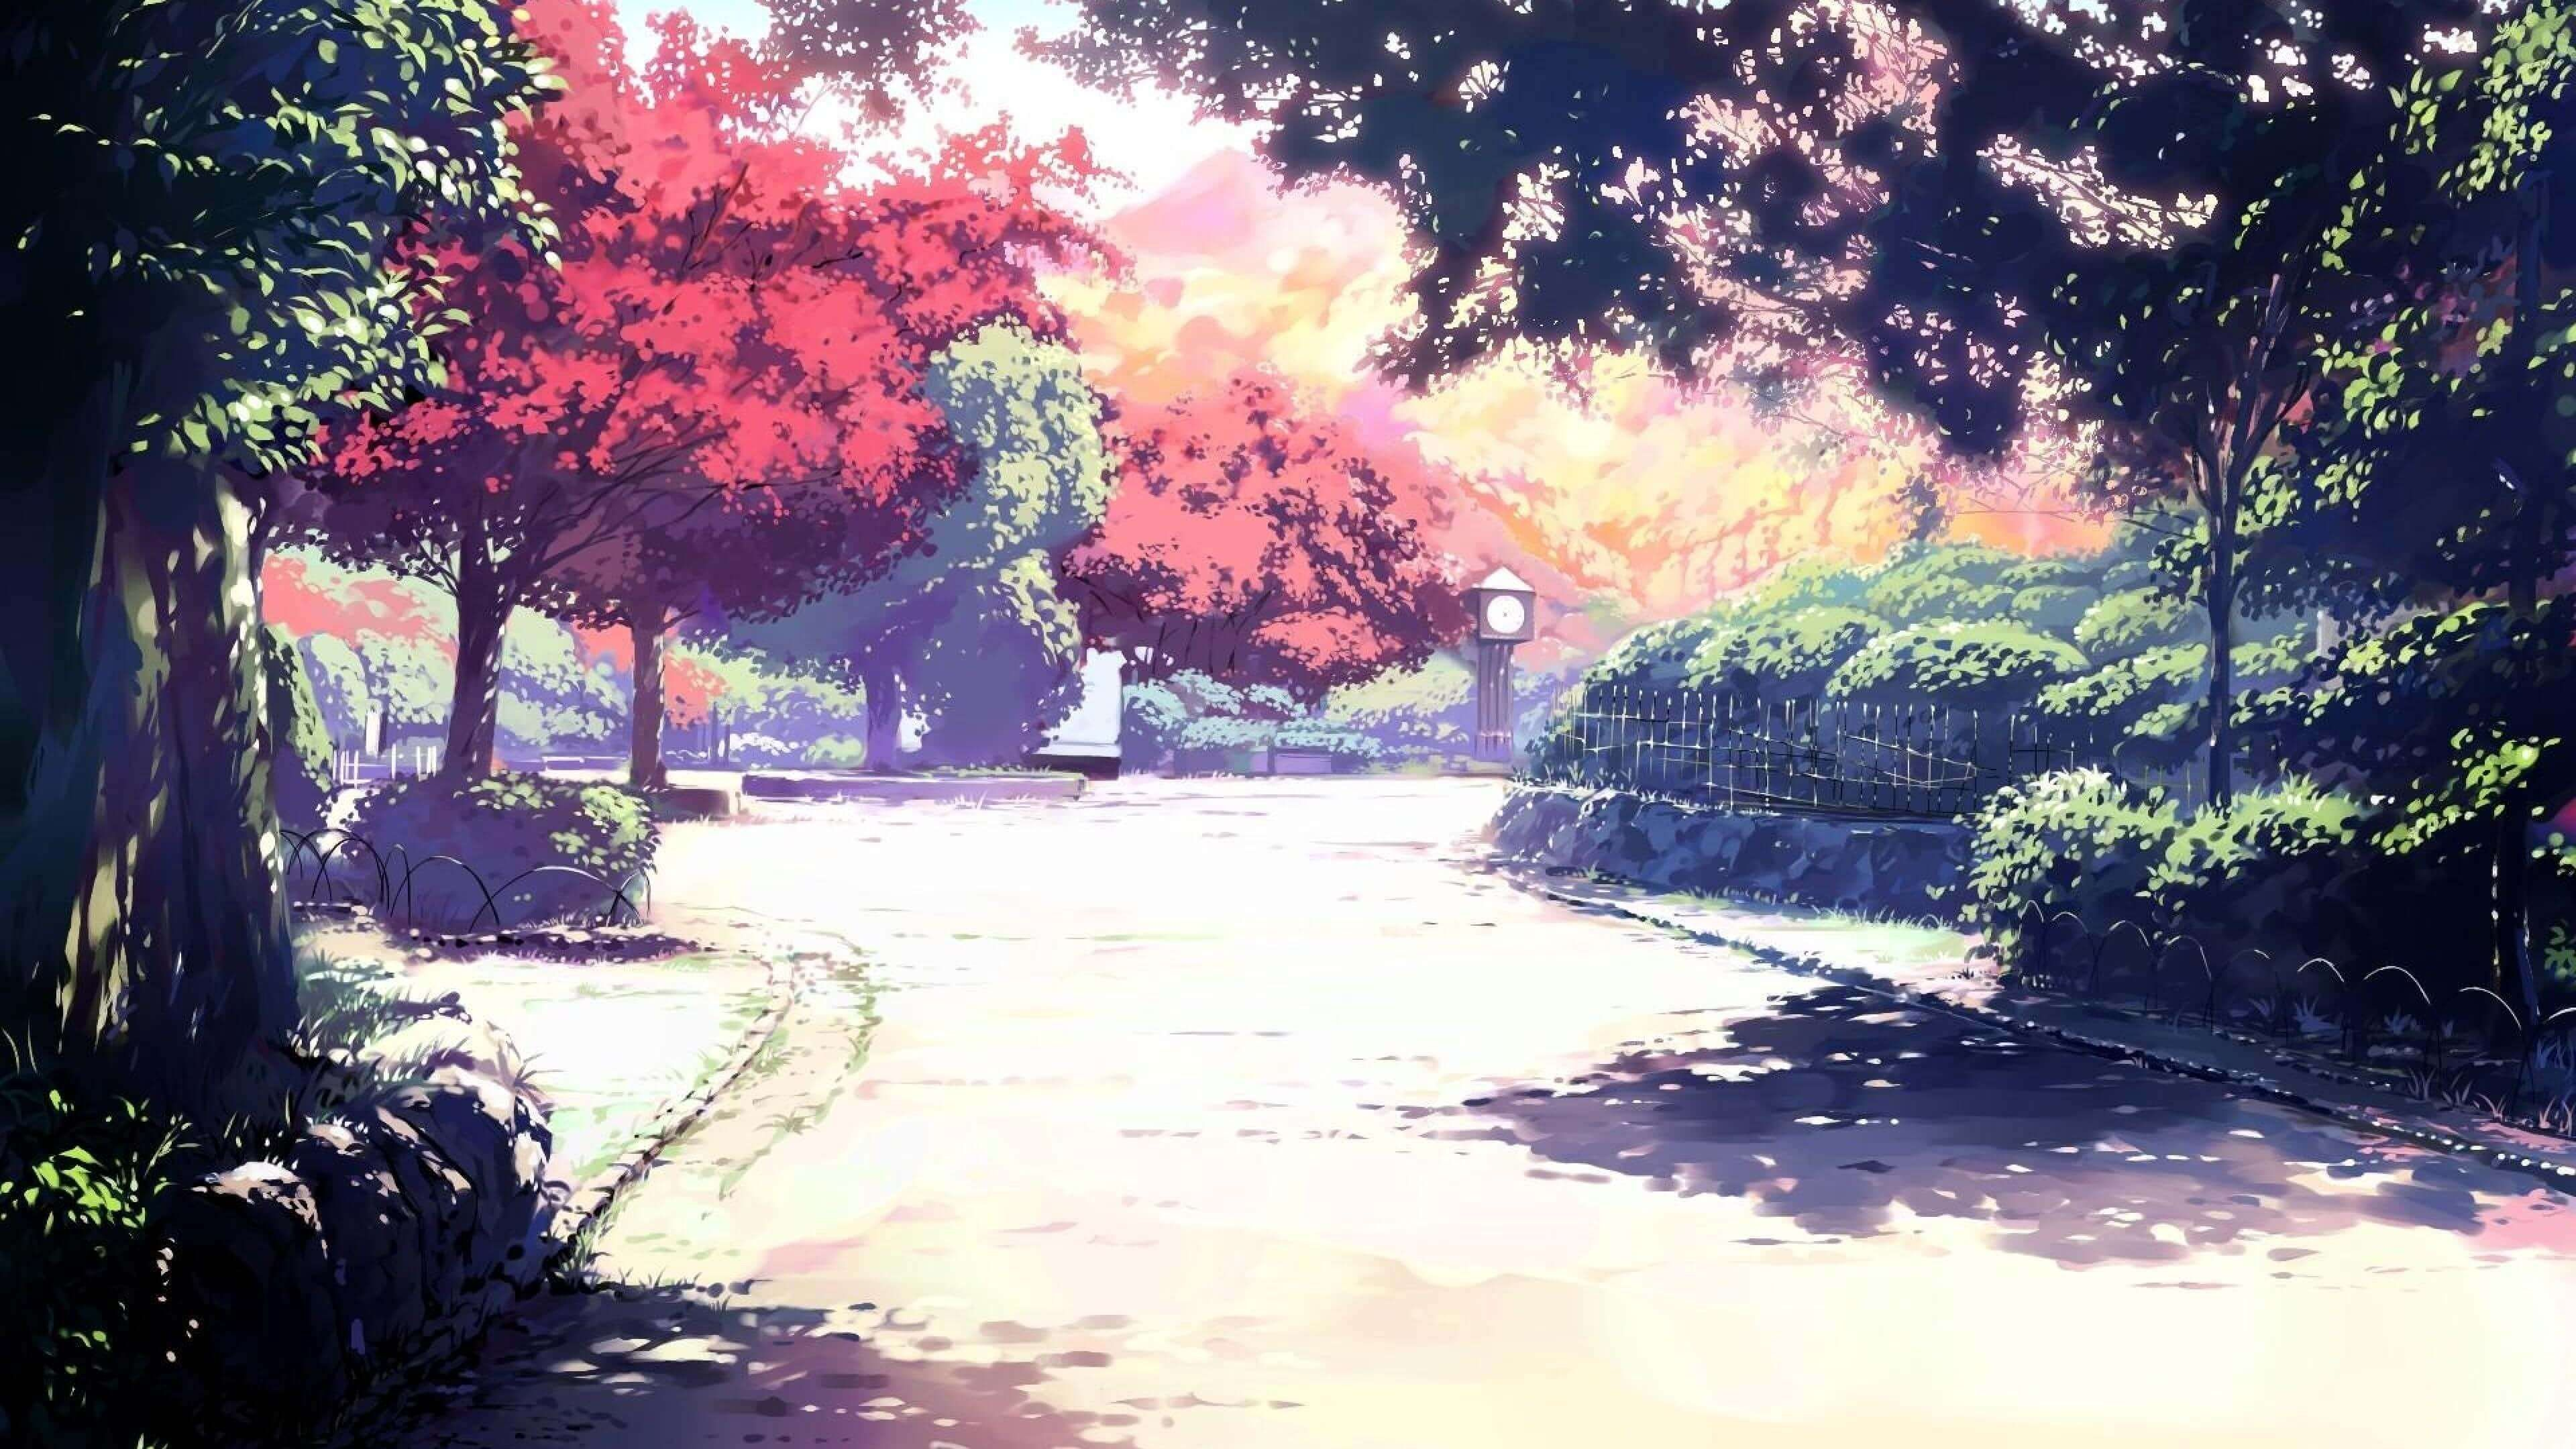 Res 3840x2160 Image For Anime Wallpaper 4k 98 264 Anime Scenery Anime Scenery Wallpaper Scenery Wallpaper